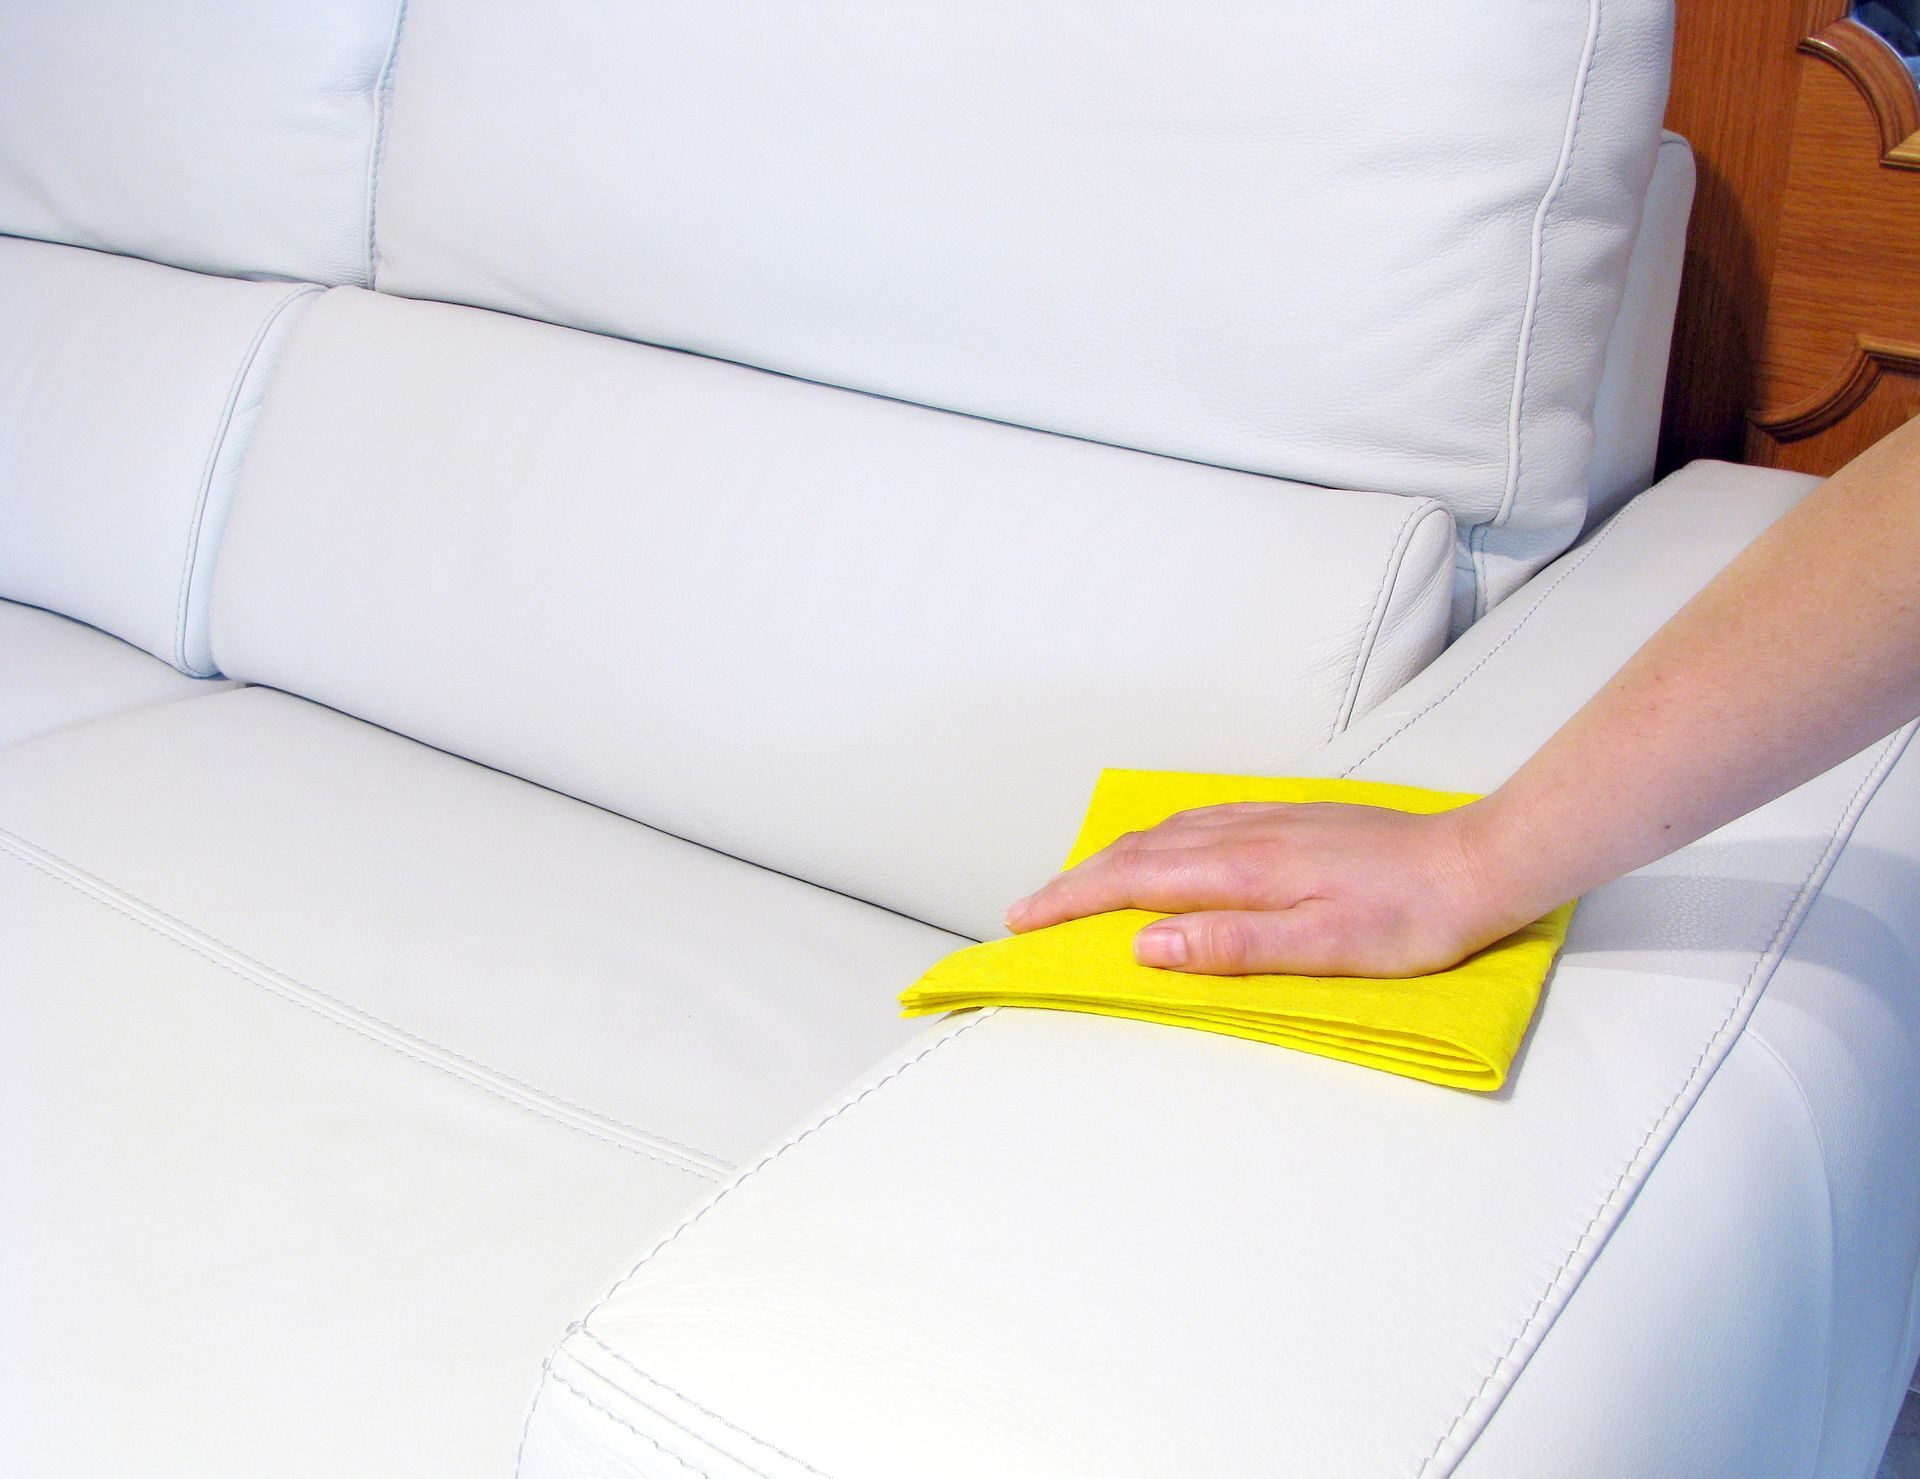 Как почистить диван в домашних условиях от грязи и запаха 56